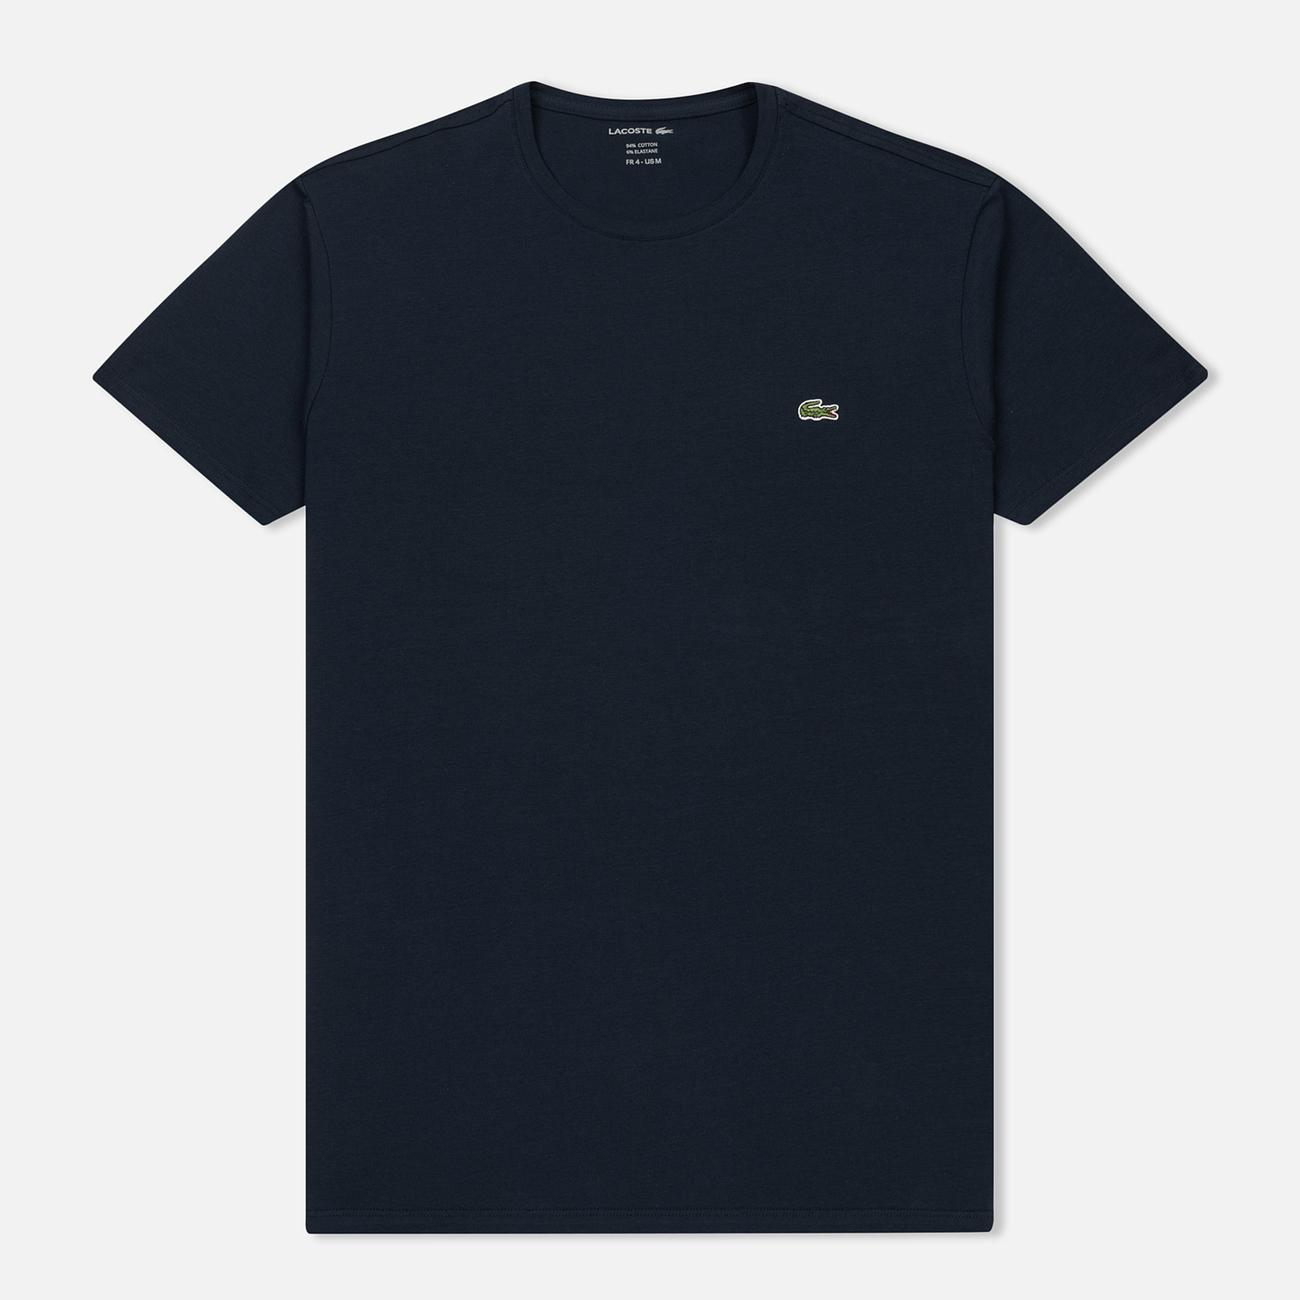 Мужская футболка Lacoste Crew Neck Pima Cotton Navy Blue